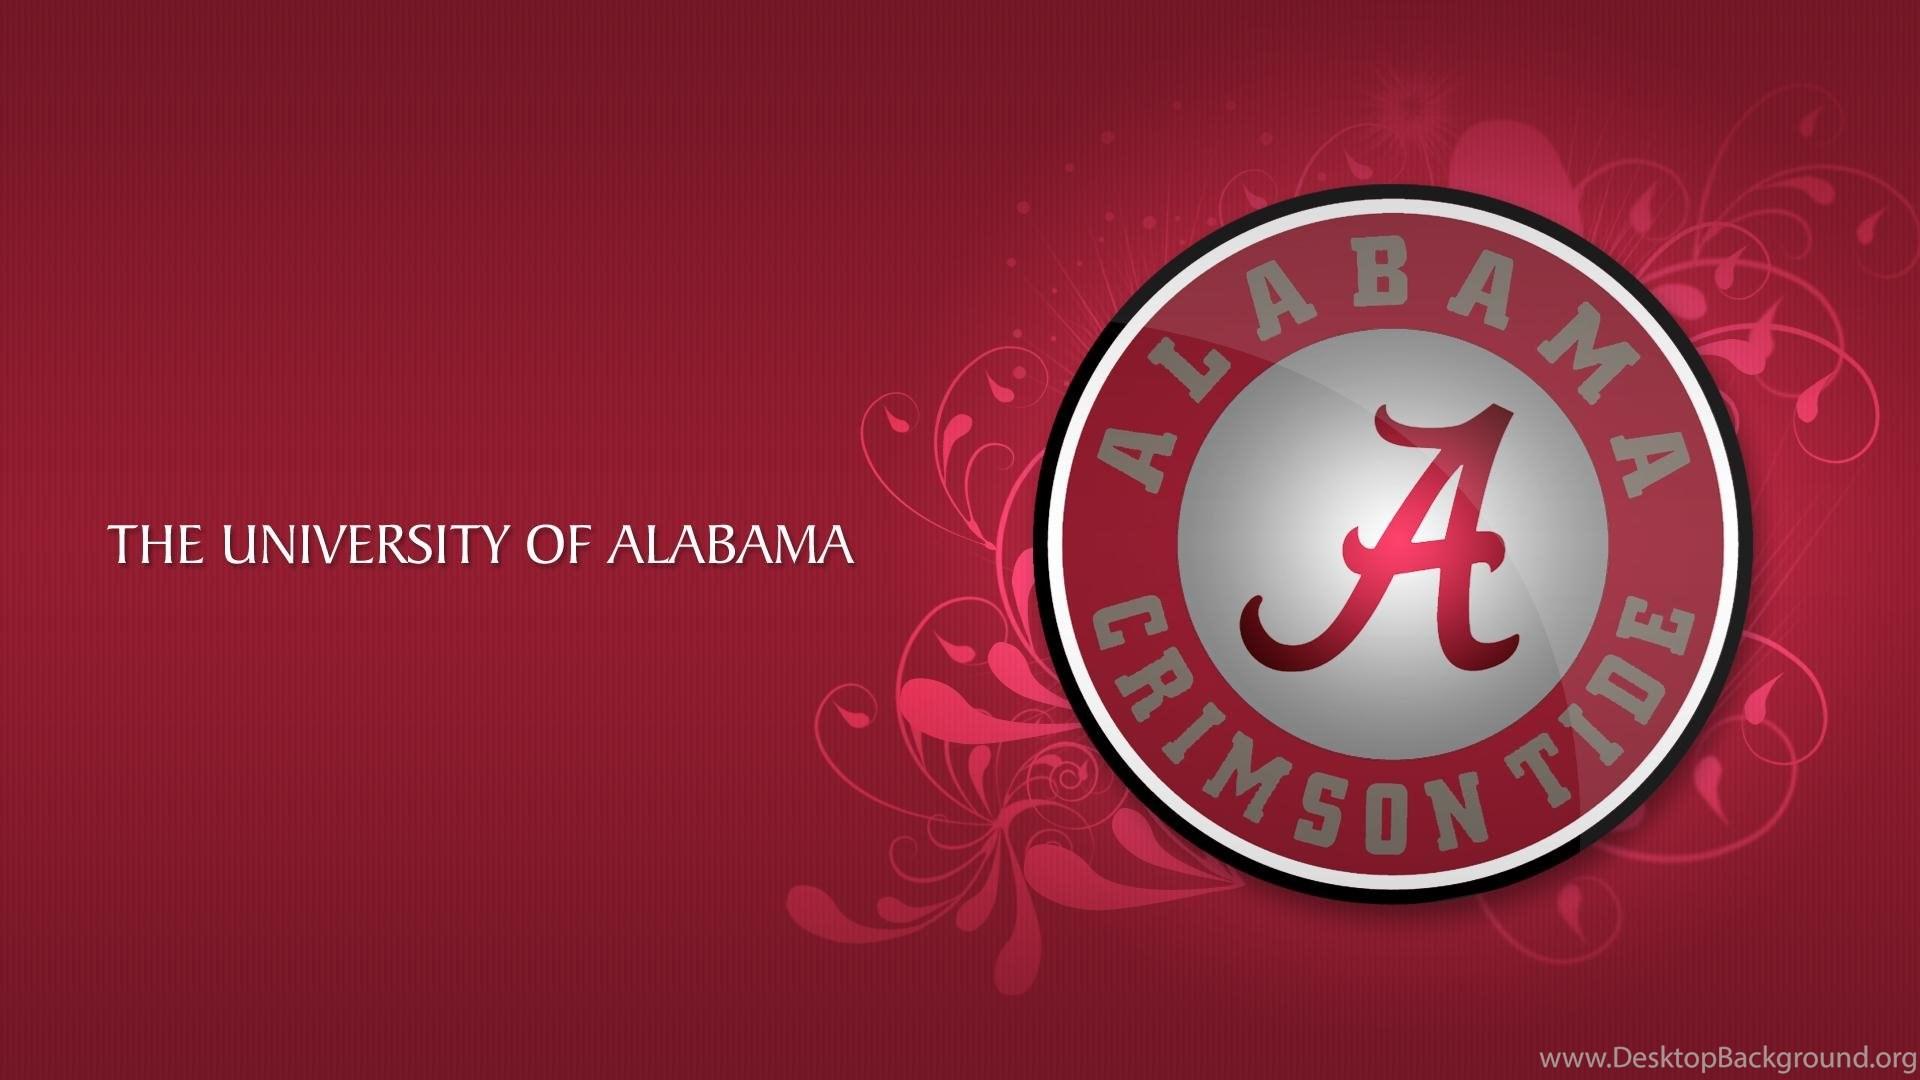 Alabama Crimson Tide Wallpaper Alabama Hd Wallpaper Alabama